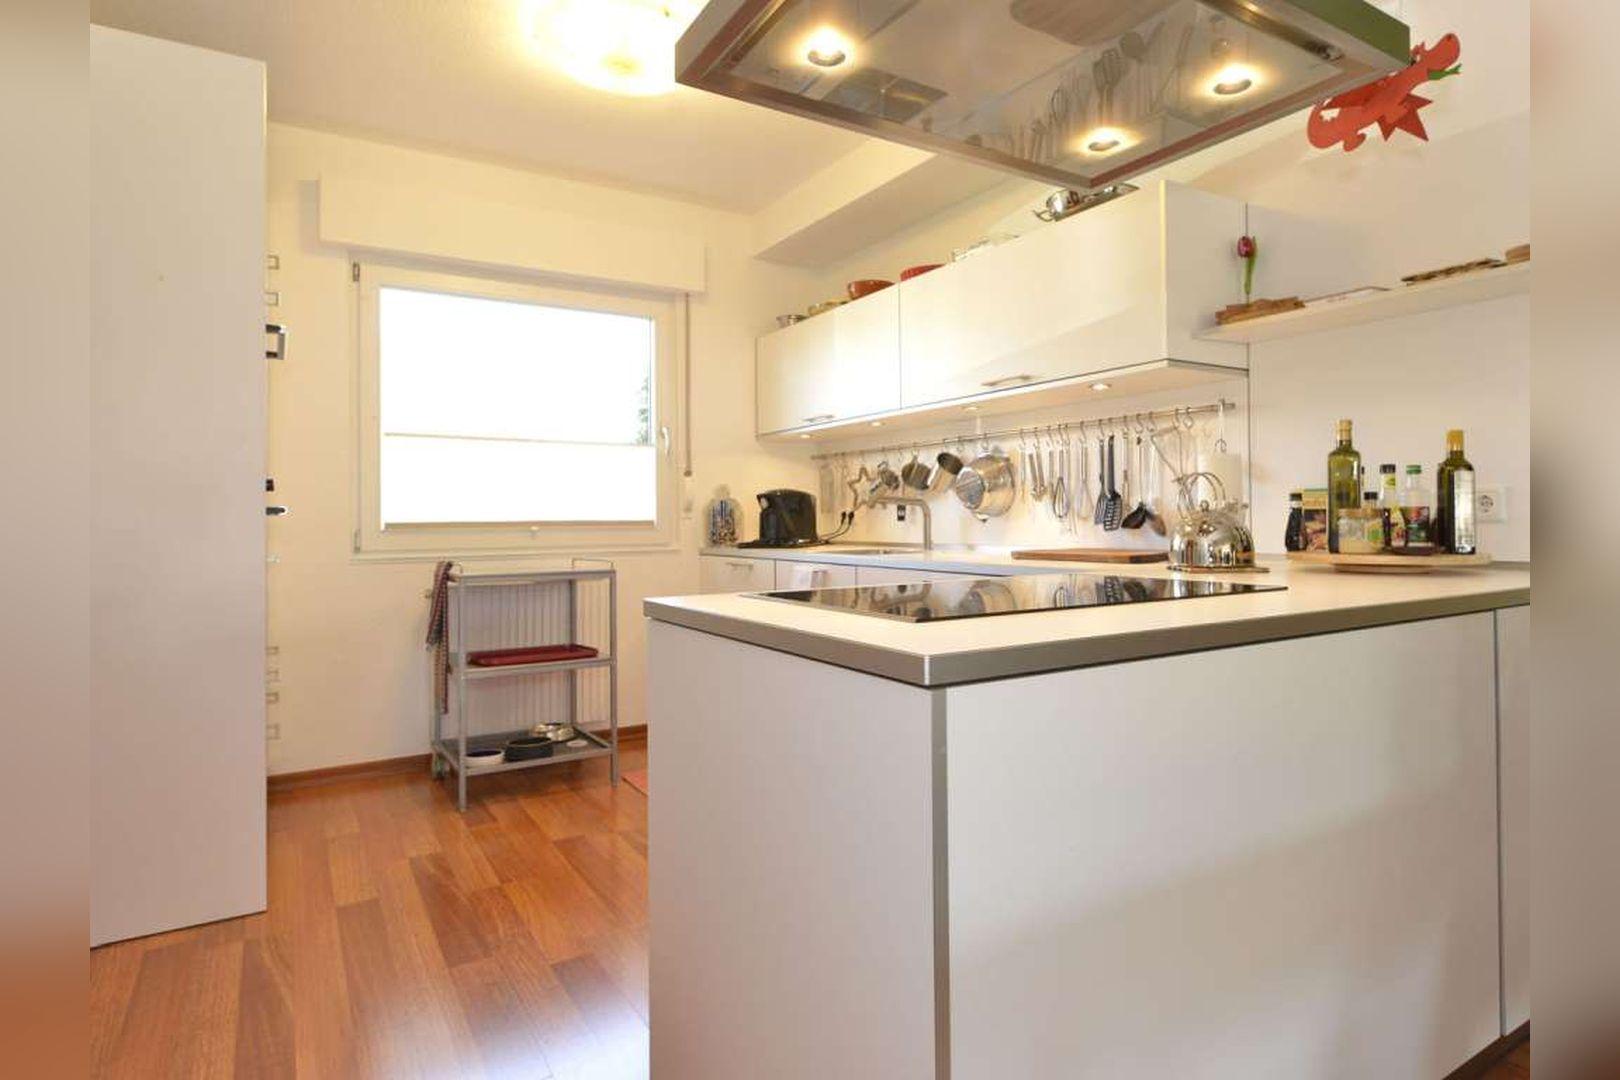 Immobilie Nr.0254 - Doppelhaushälfte rechtsbündig mit Garage & Carport  - Bild 10.jpg